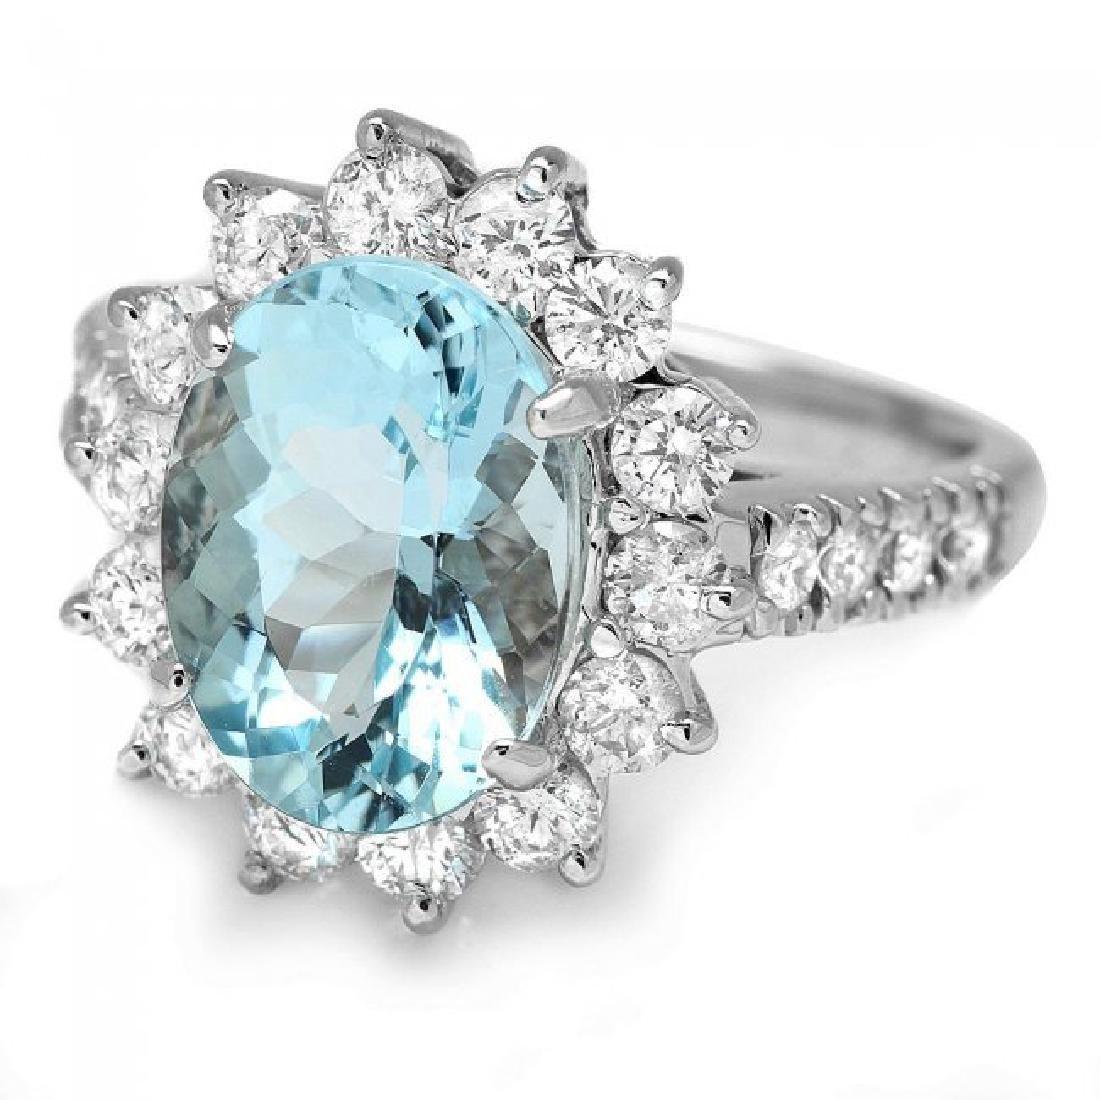 14k Gold 3.00ct Aquamarine 1.10ct Diamond Ring - 2